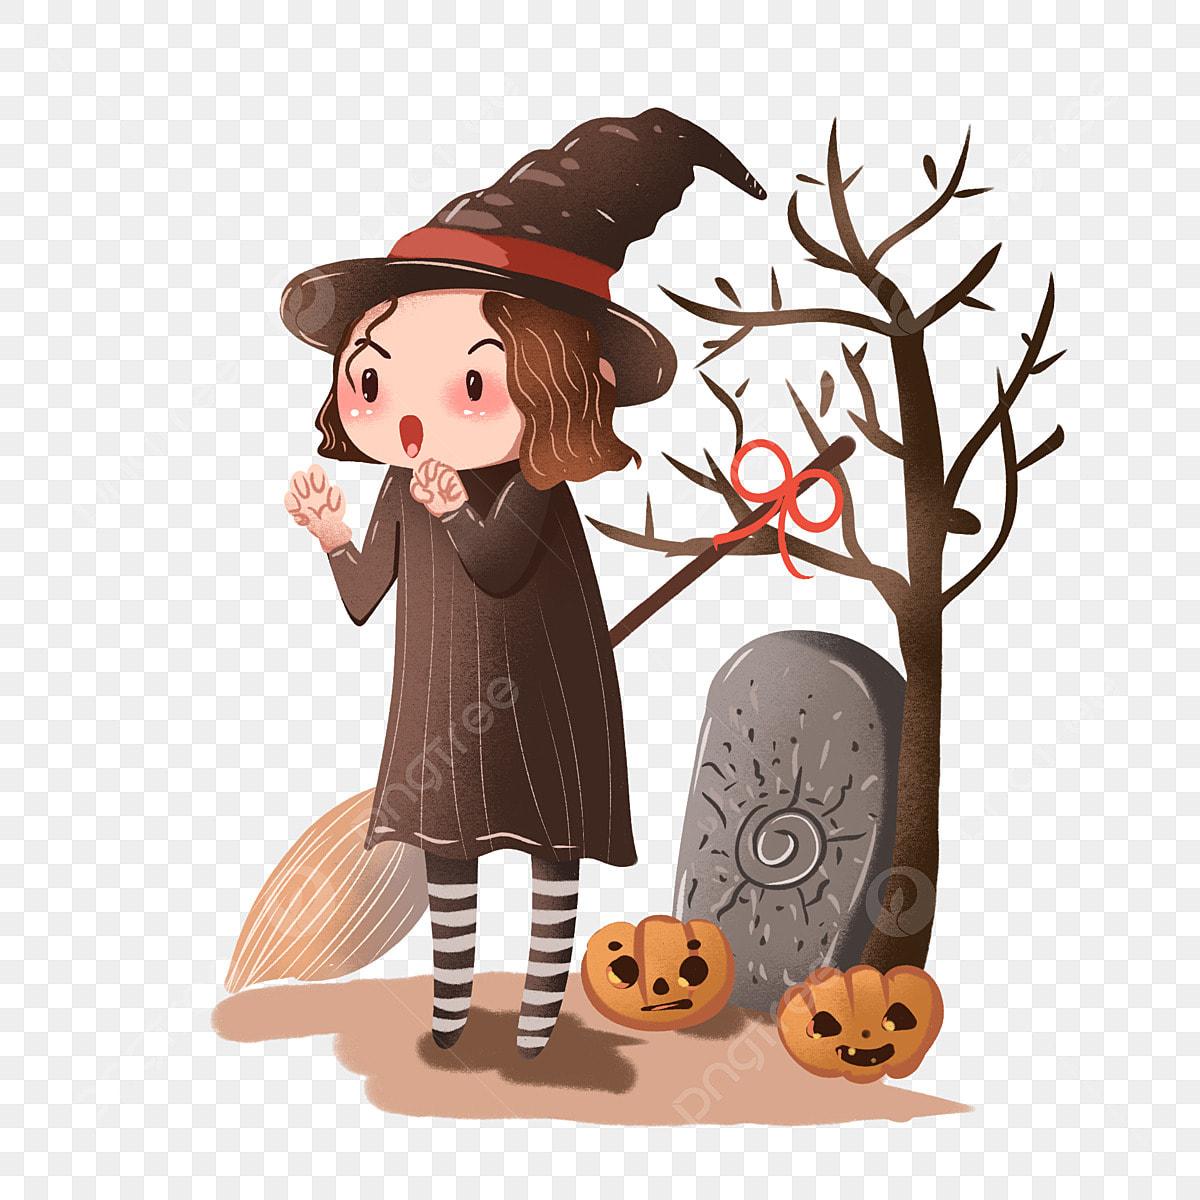 Decoration Sorciere Halloween.Halloween Mignonne Petite Sorcière Décorative Halloween Mignon